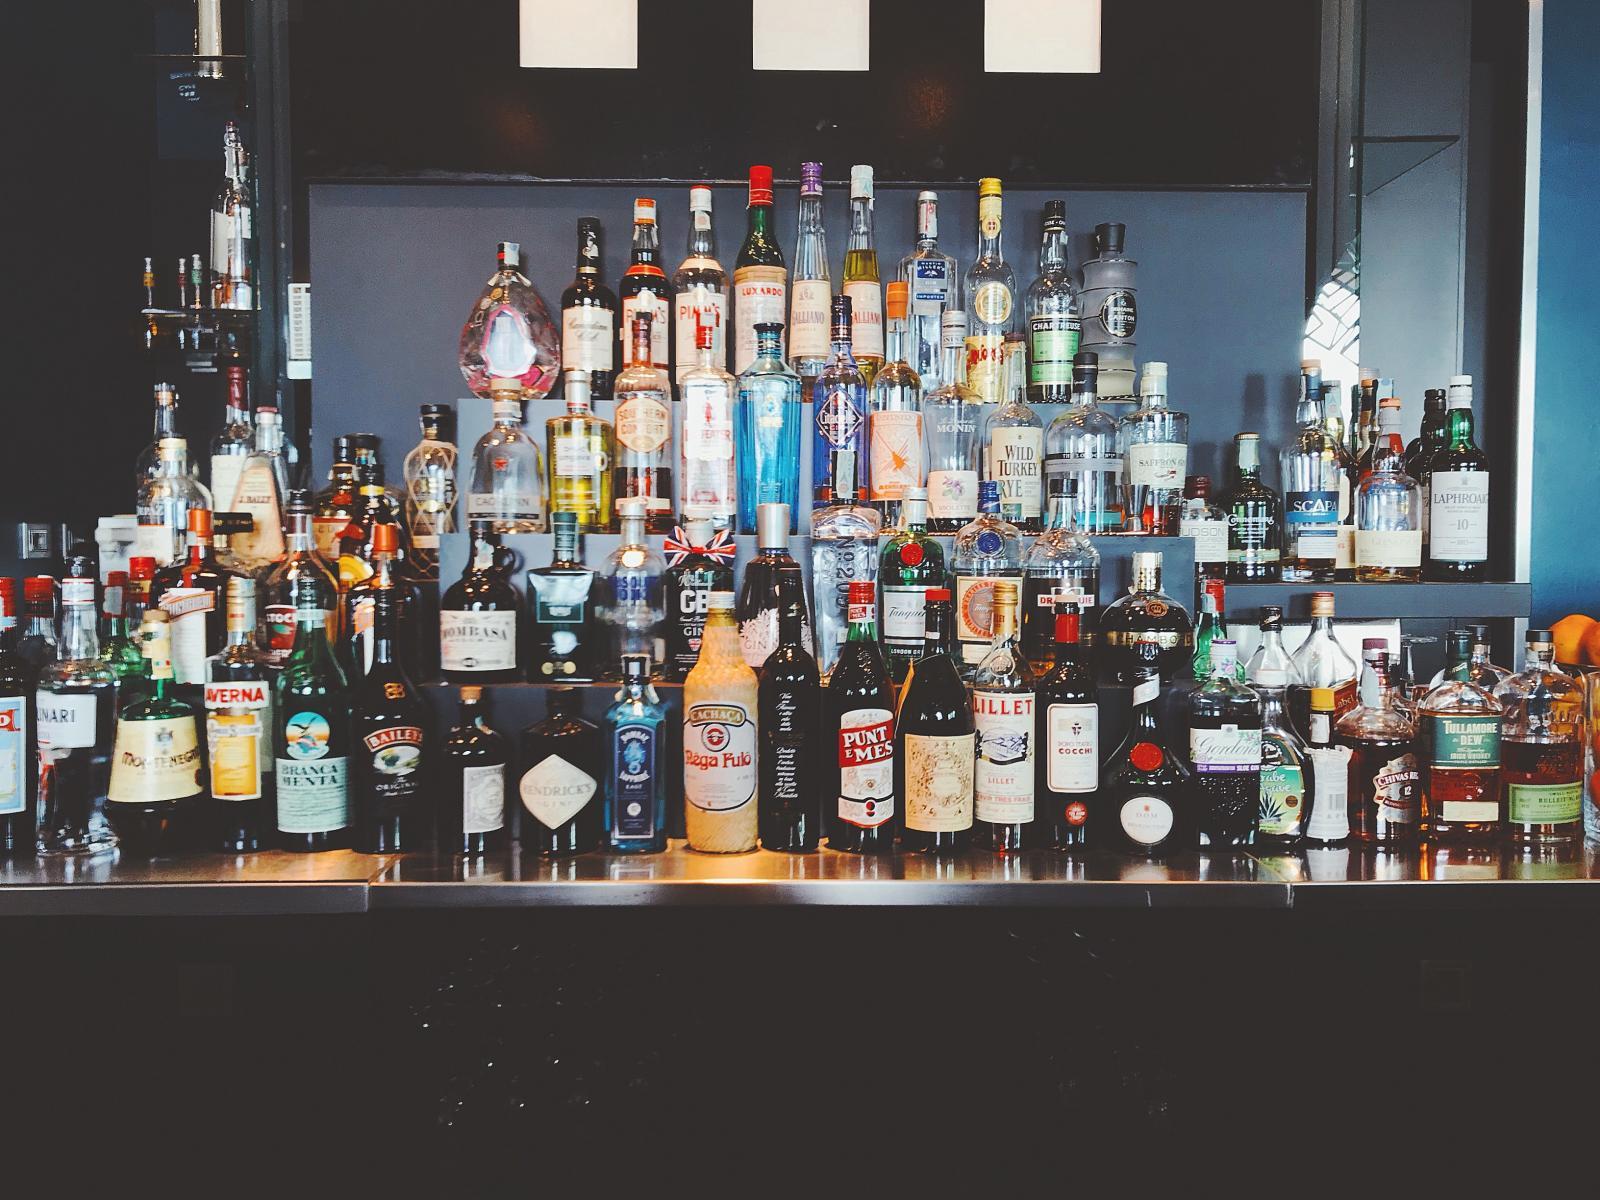 Range of bar drinks. Photo credit: Oleg Magni pexels.com